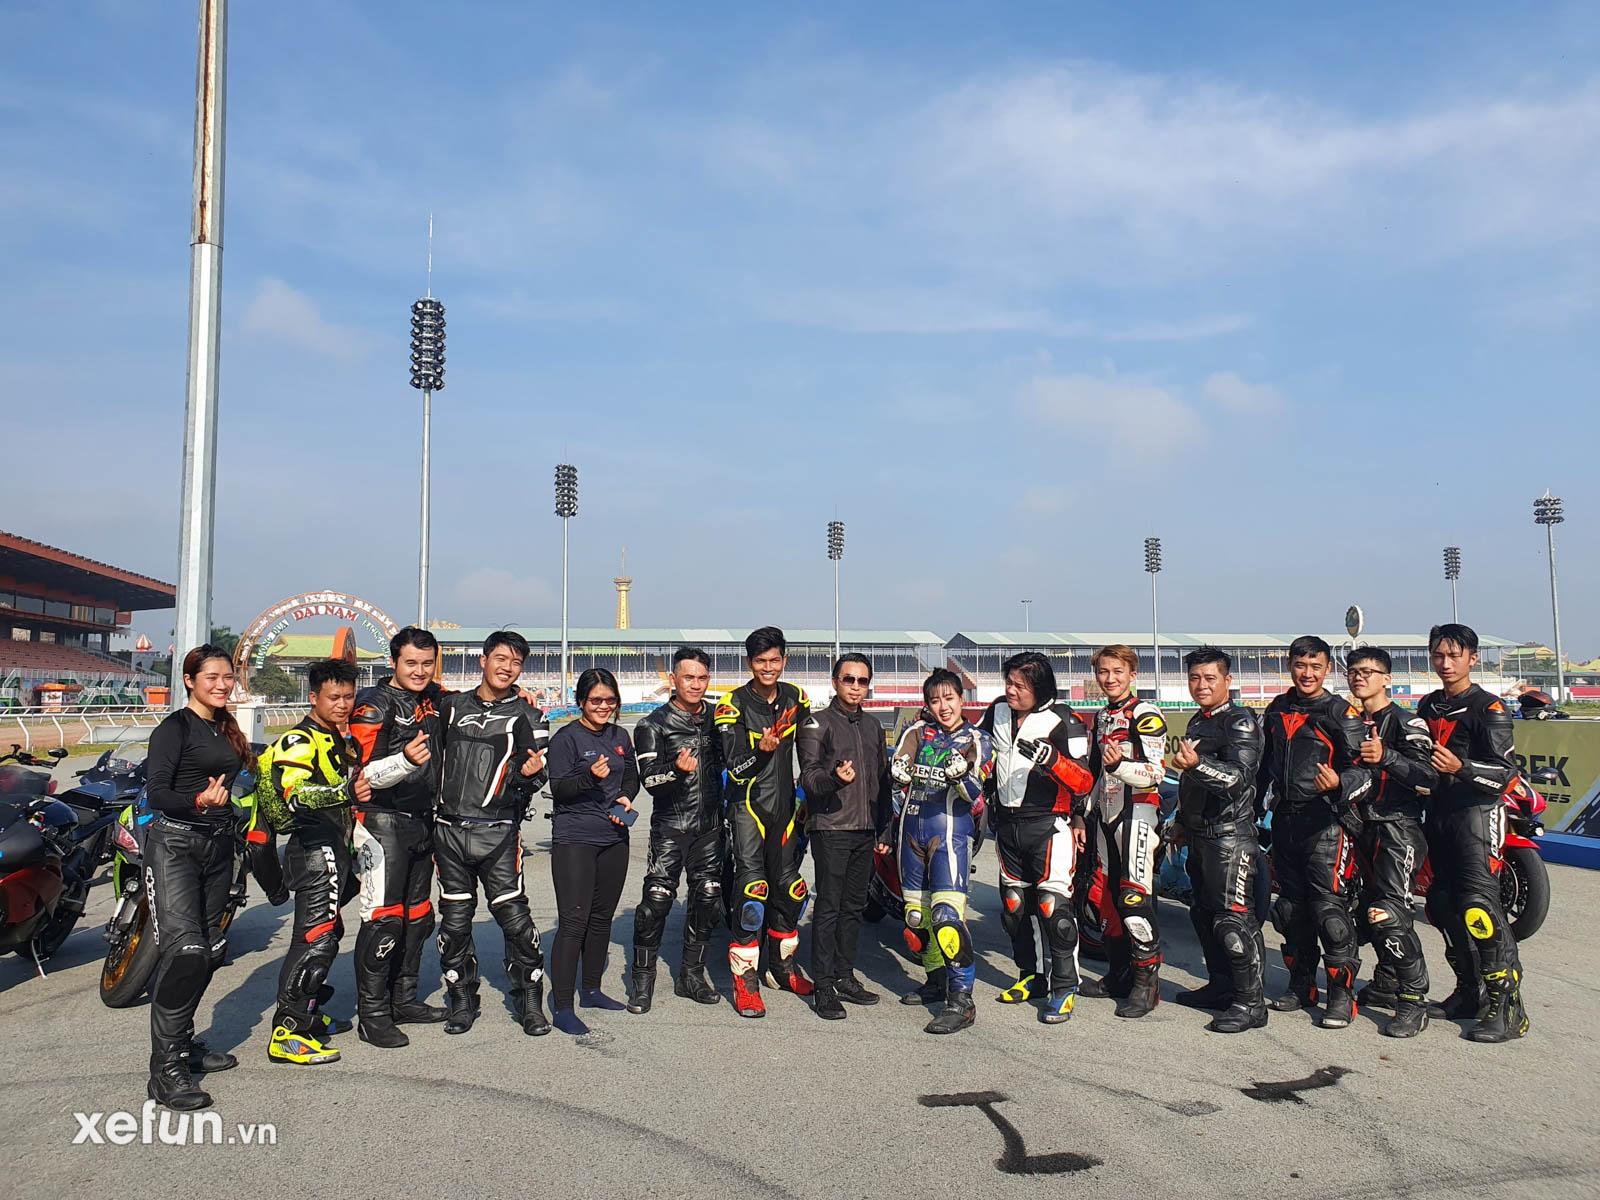 Tin mới nhất Giải đua xe Môtô Awakening Road 2021 Xefun - 2 (26)3546